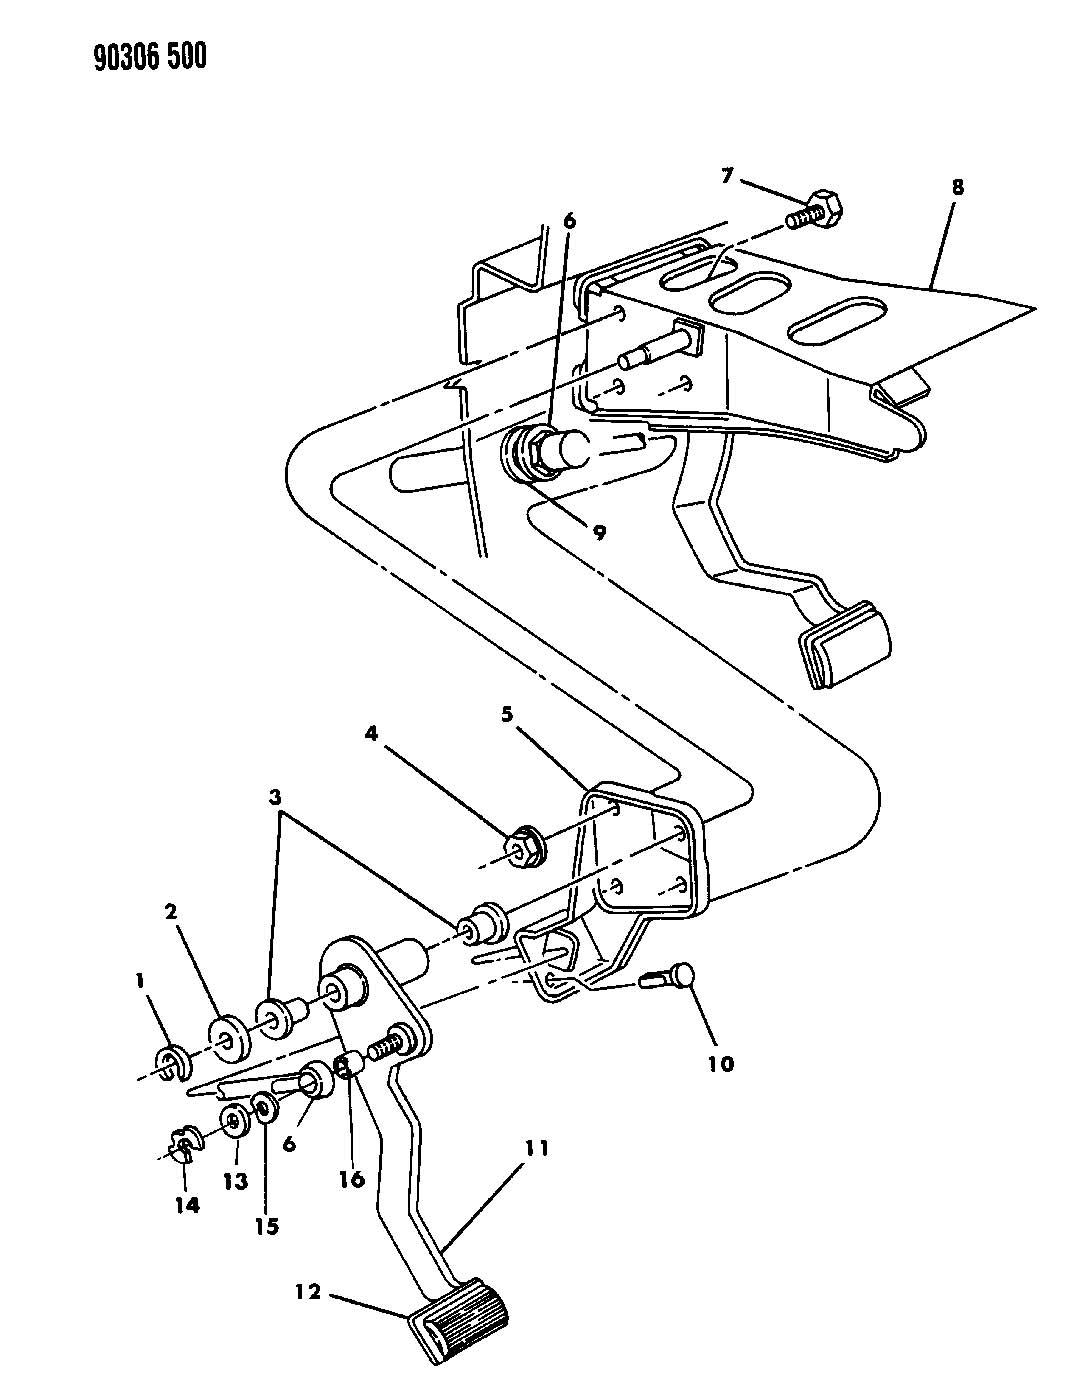 Dodge Dakota PEDAL, CLUTCH N BODY WITH 2.5L, 3.9L ENGINE